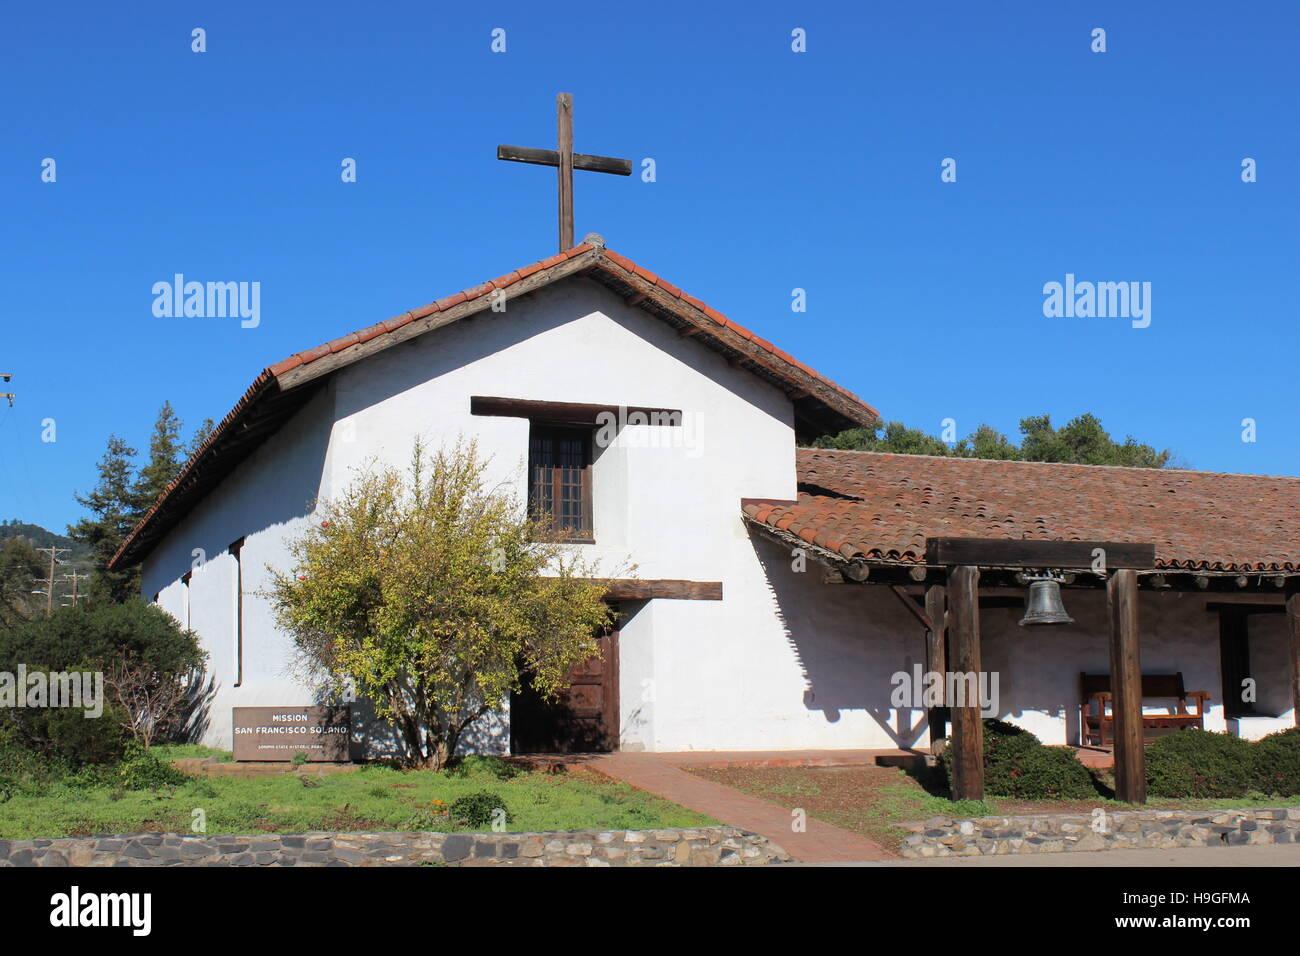 Mission San Francisco Solano, Sonoma State Historic Park, Sonoma, California - Stock Image